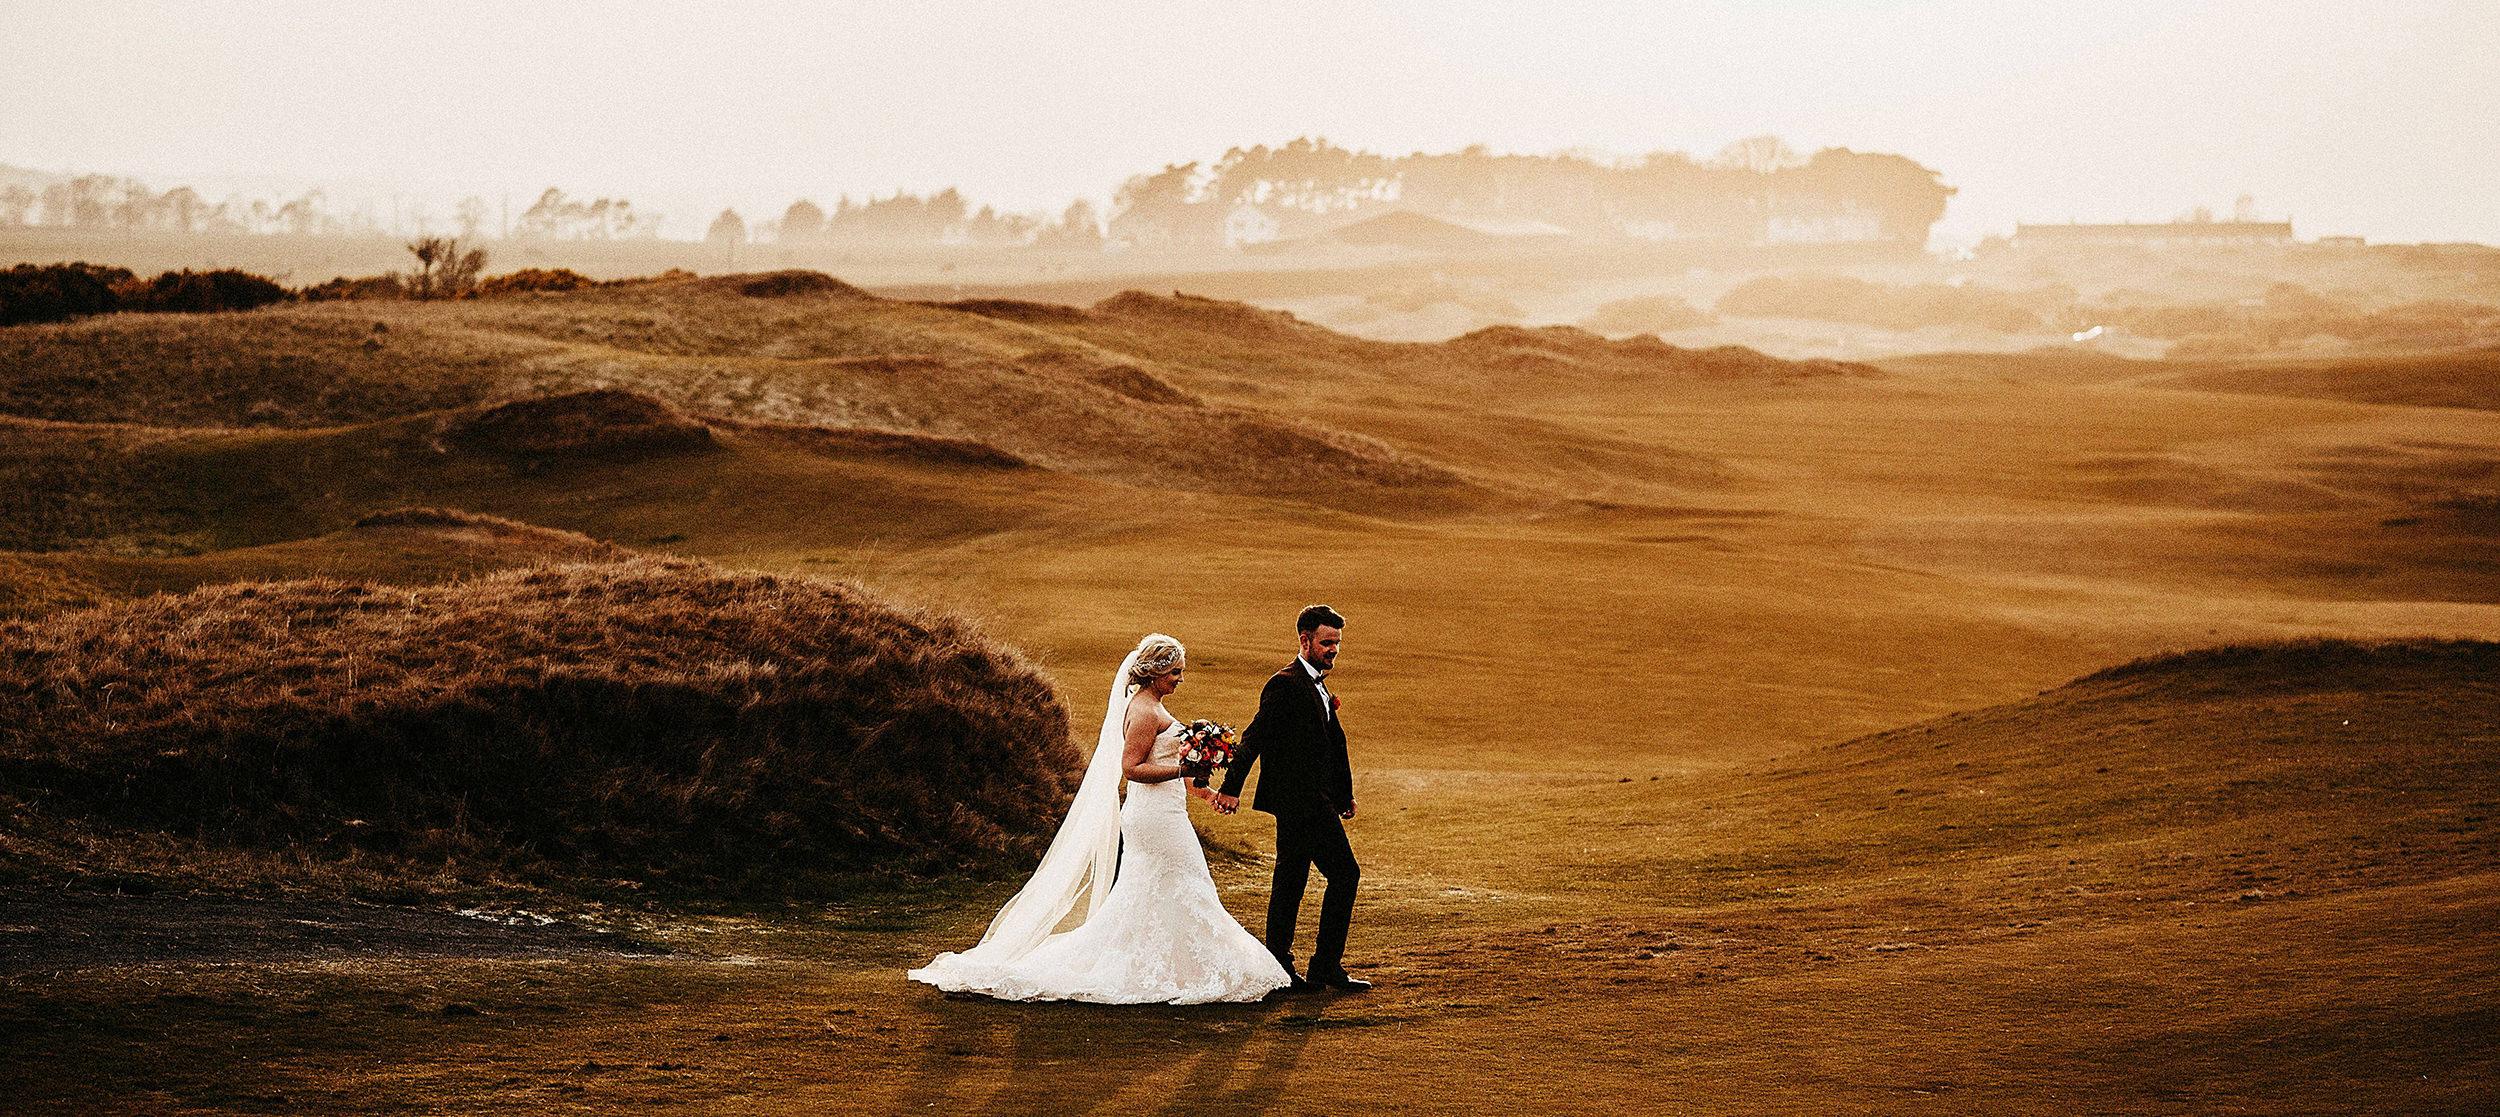 Kinkell Byre Wedding Photography